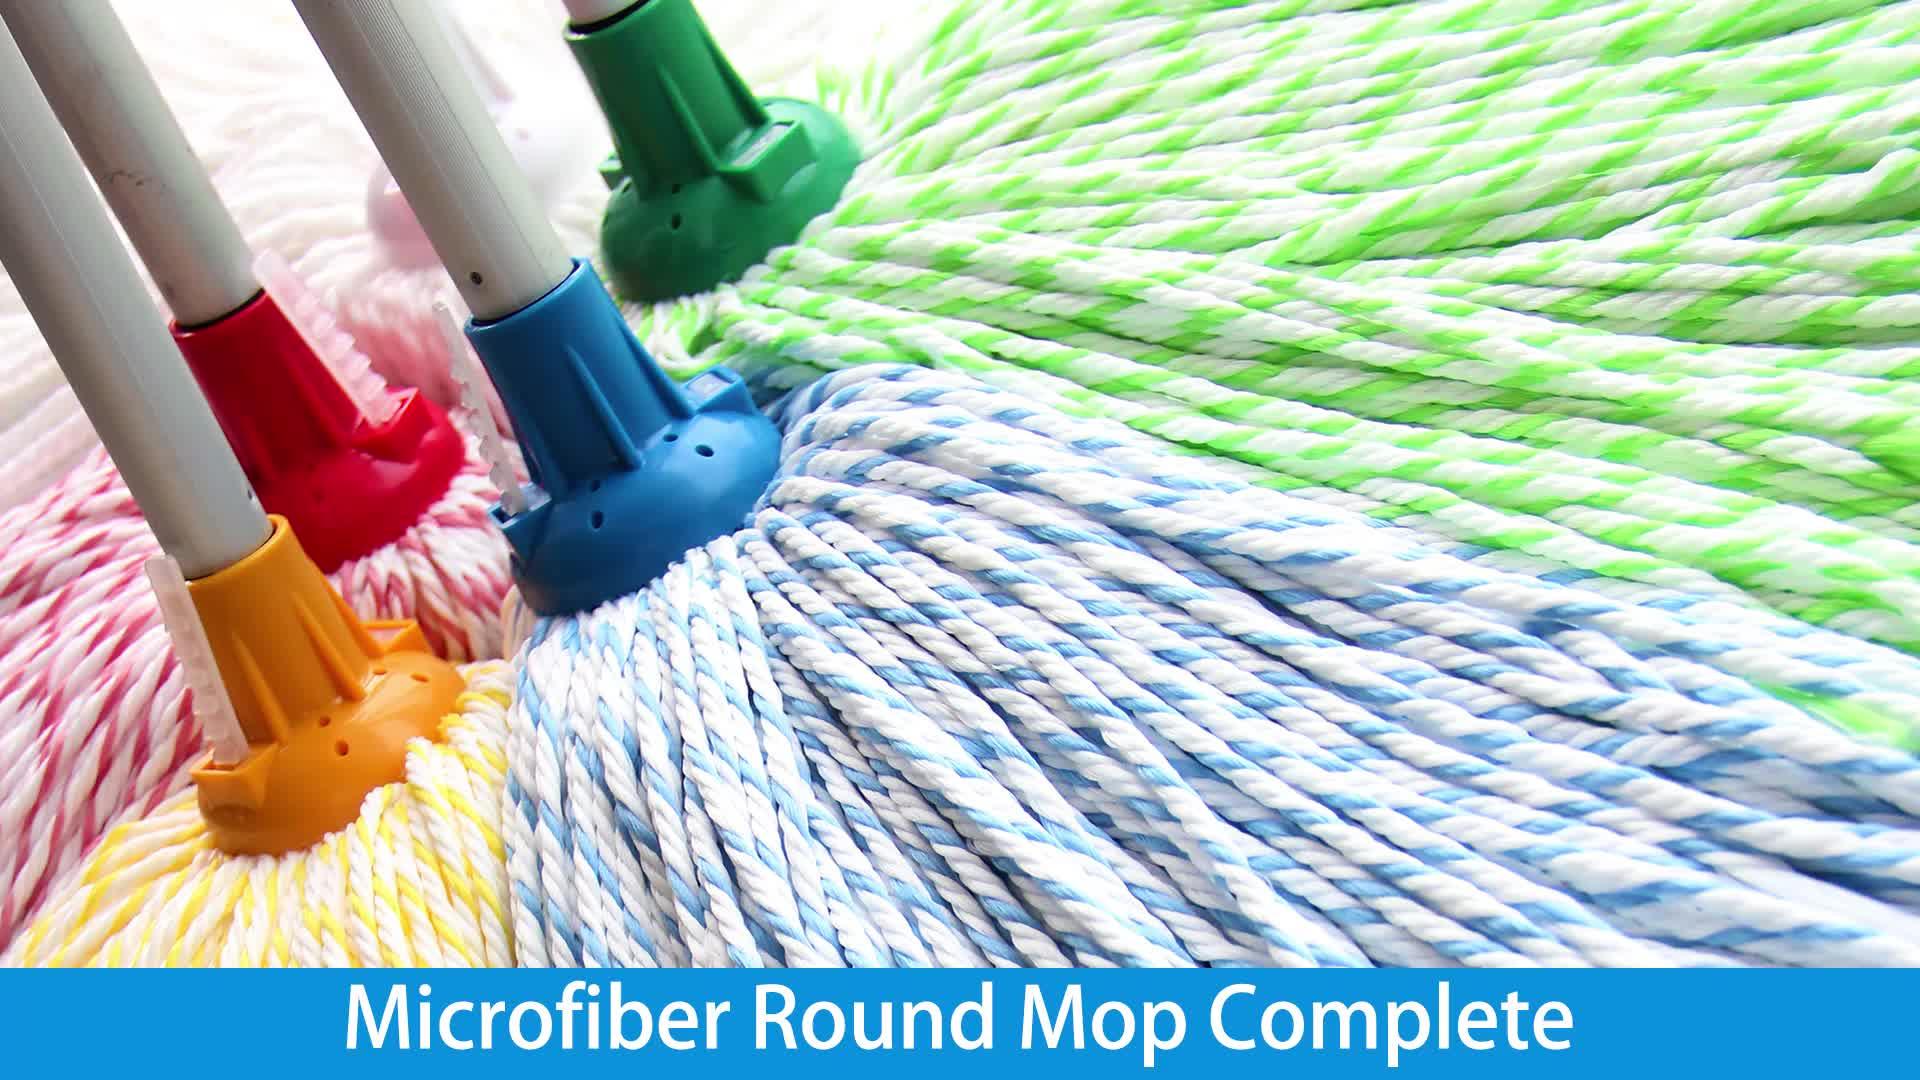 Super Efeito de Limpeza Projeto Especial 230g ou 250g de Microfibra Rodada Fio Mop com Cabo